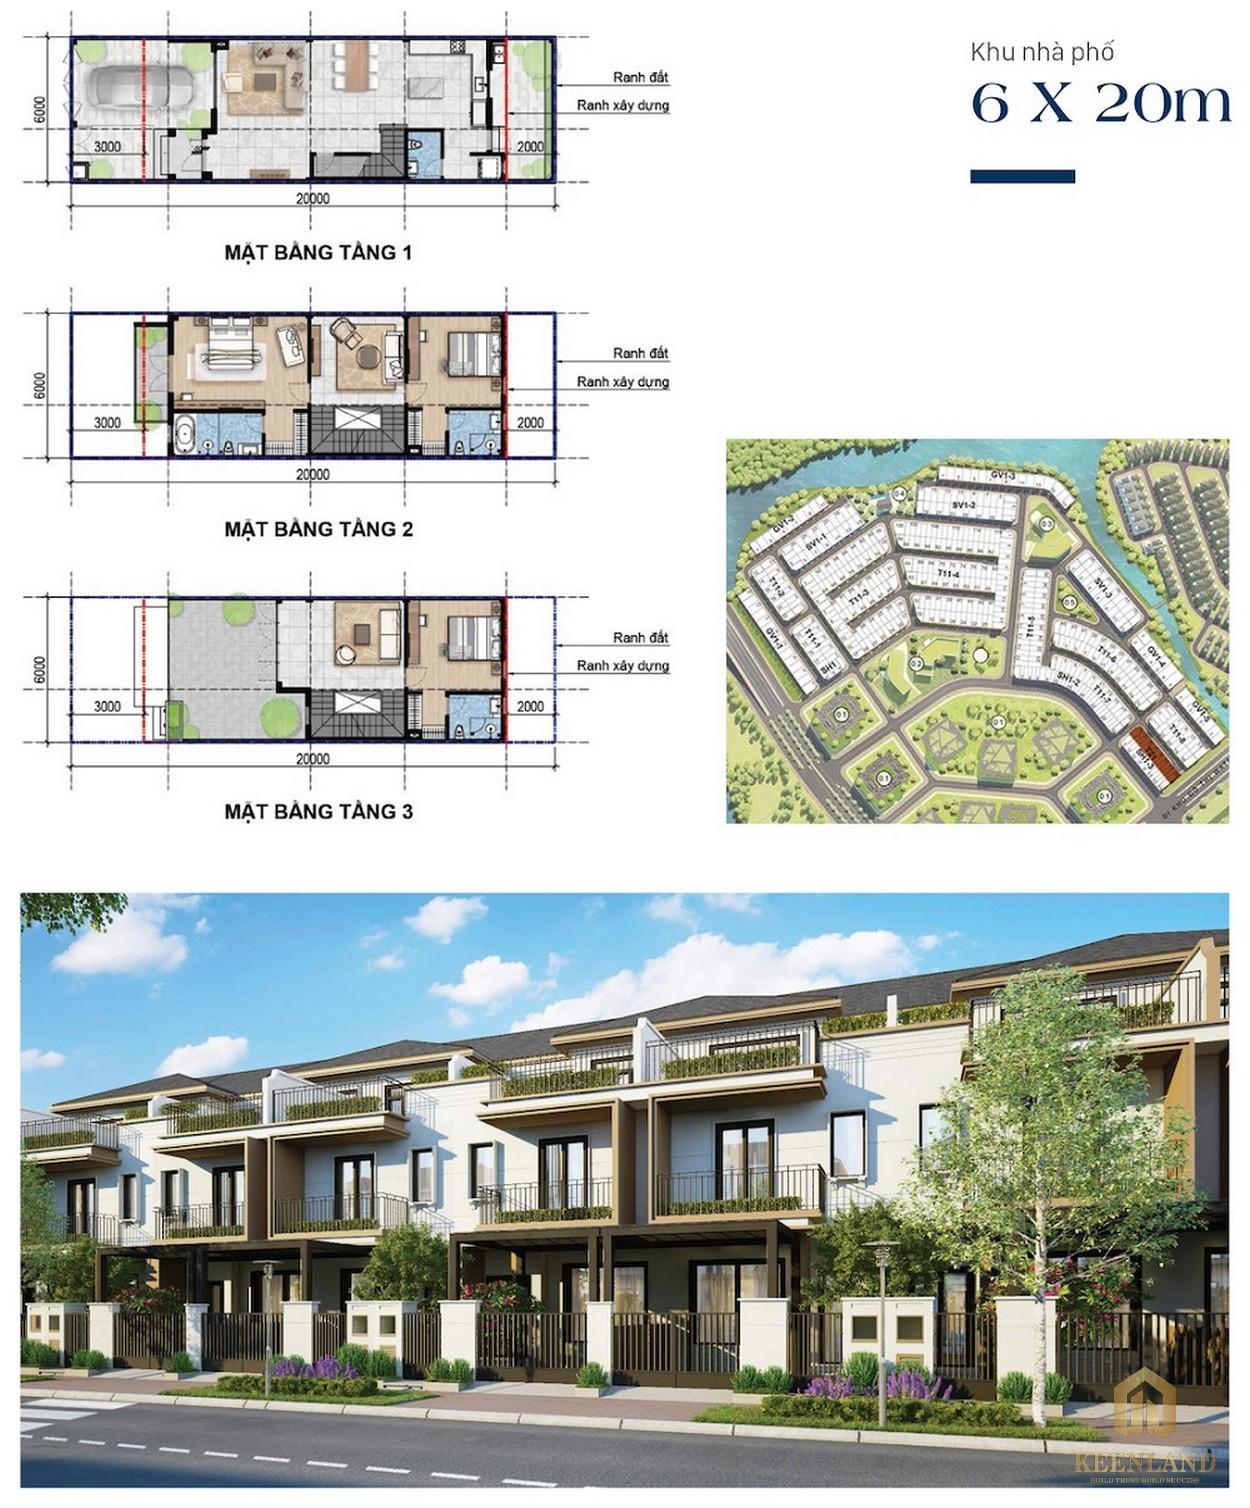 Thiết kế nhà phố 6mx20m Aqua City Novaland